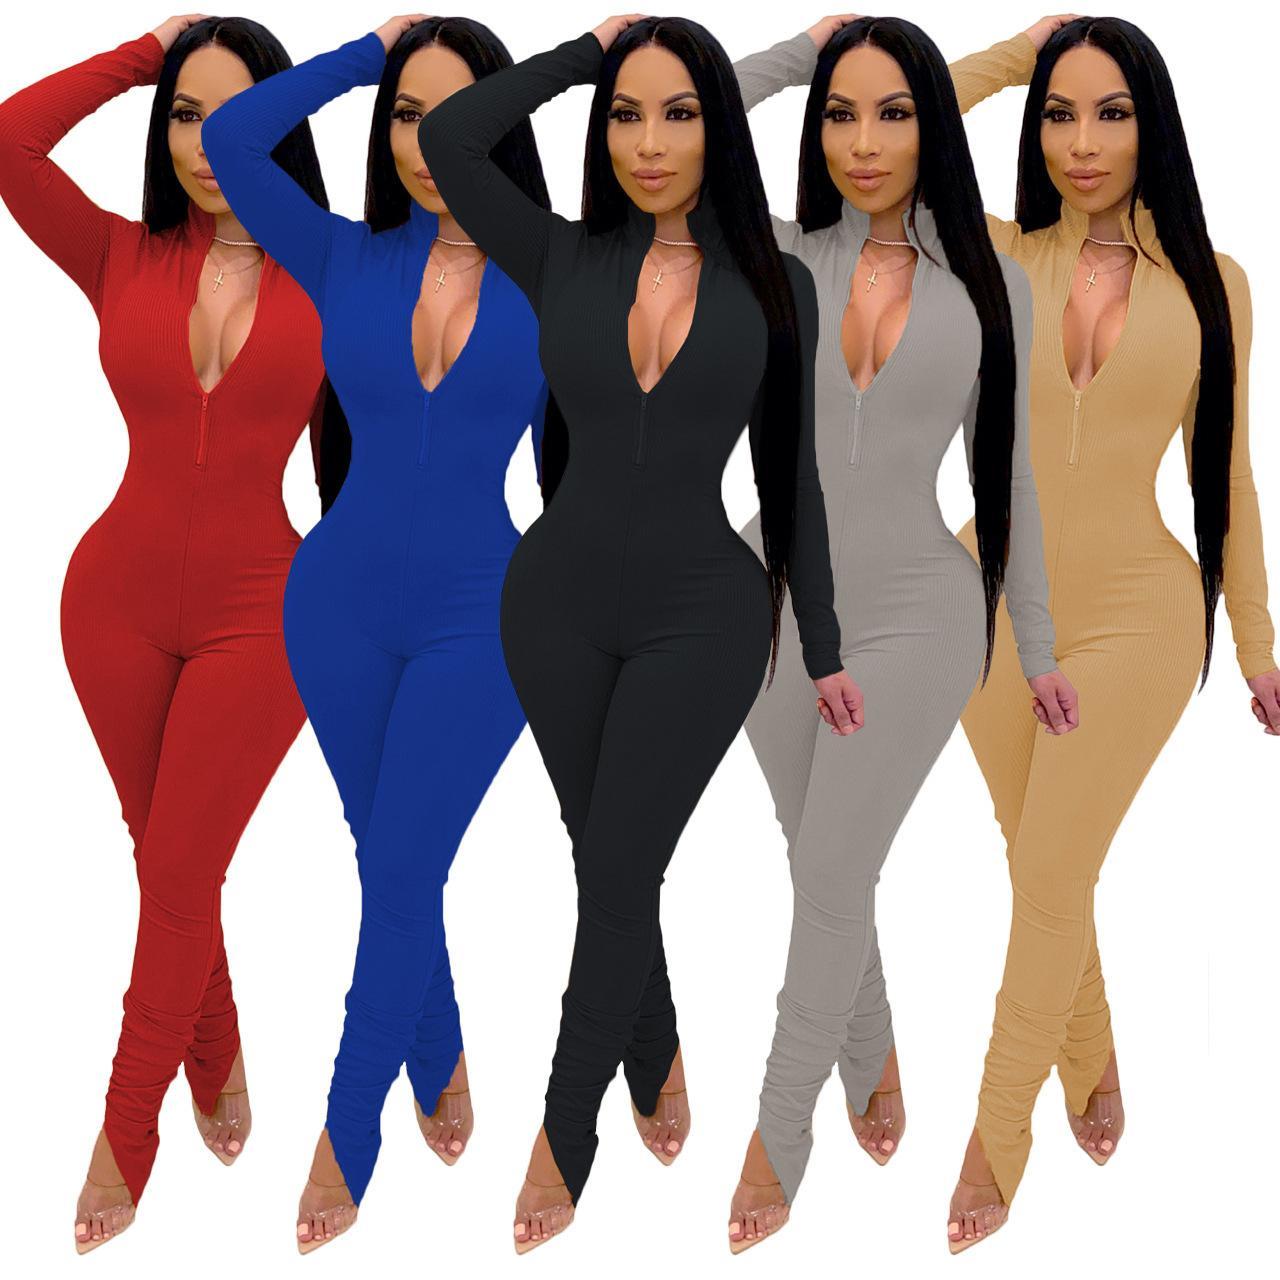 Otoño 2020 Femenino Clásico Color Sólido Plaisado Pile Up Mono Moda Diseñador Estilo Color Sólido Manga Larga V Jumpsuit Sexy